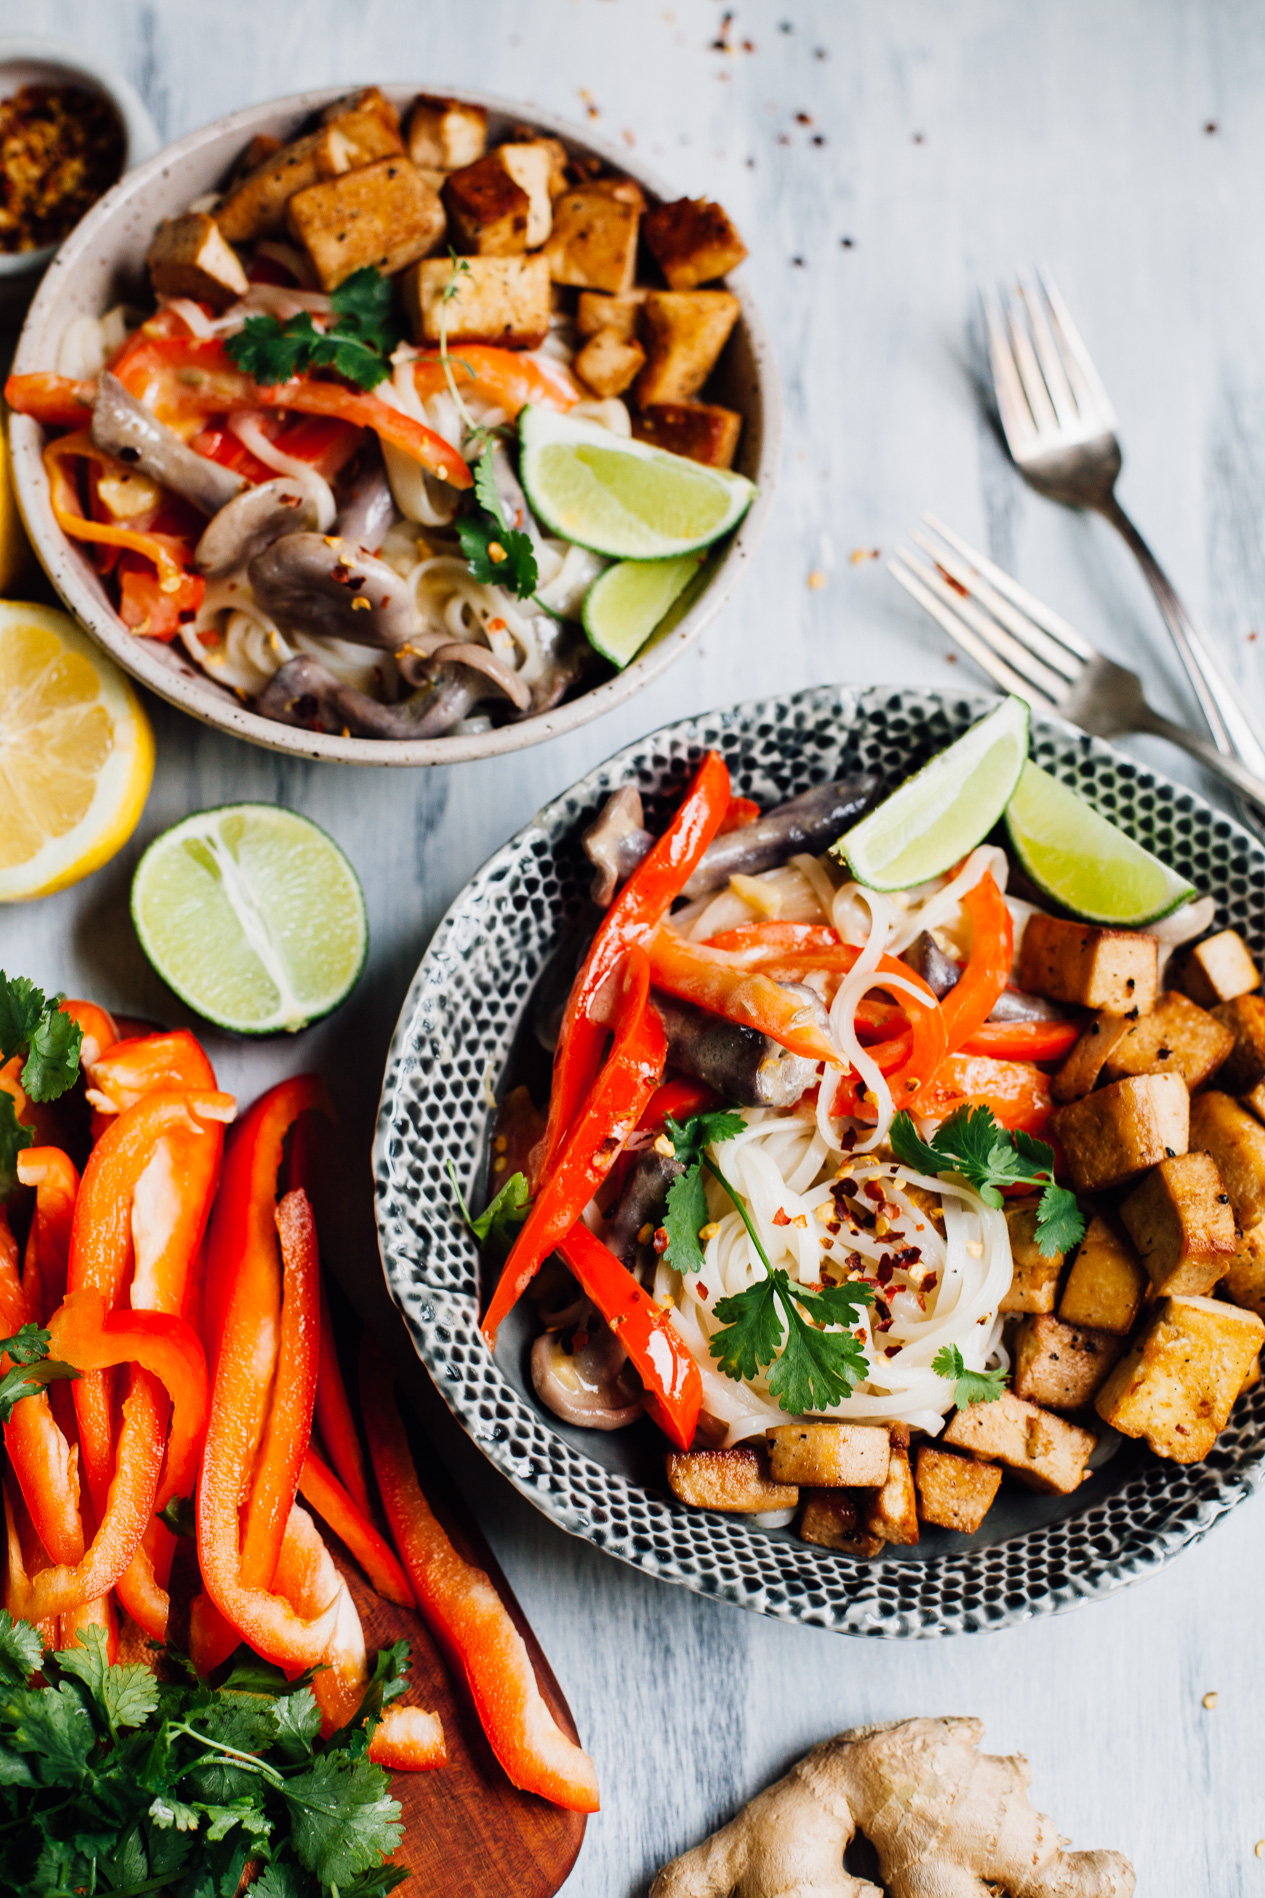 Vegan Thai-Style Coconut Lime Noodles with Tamari Fried Tofu